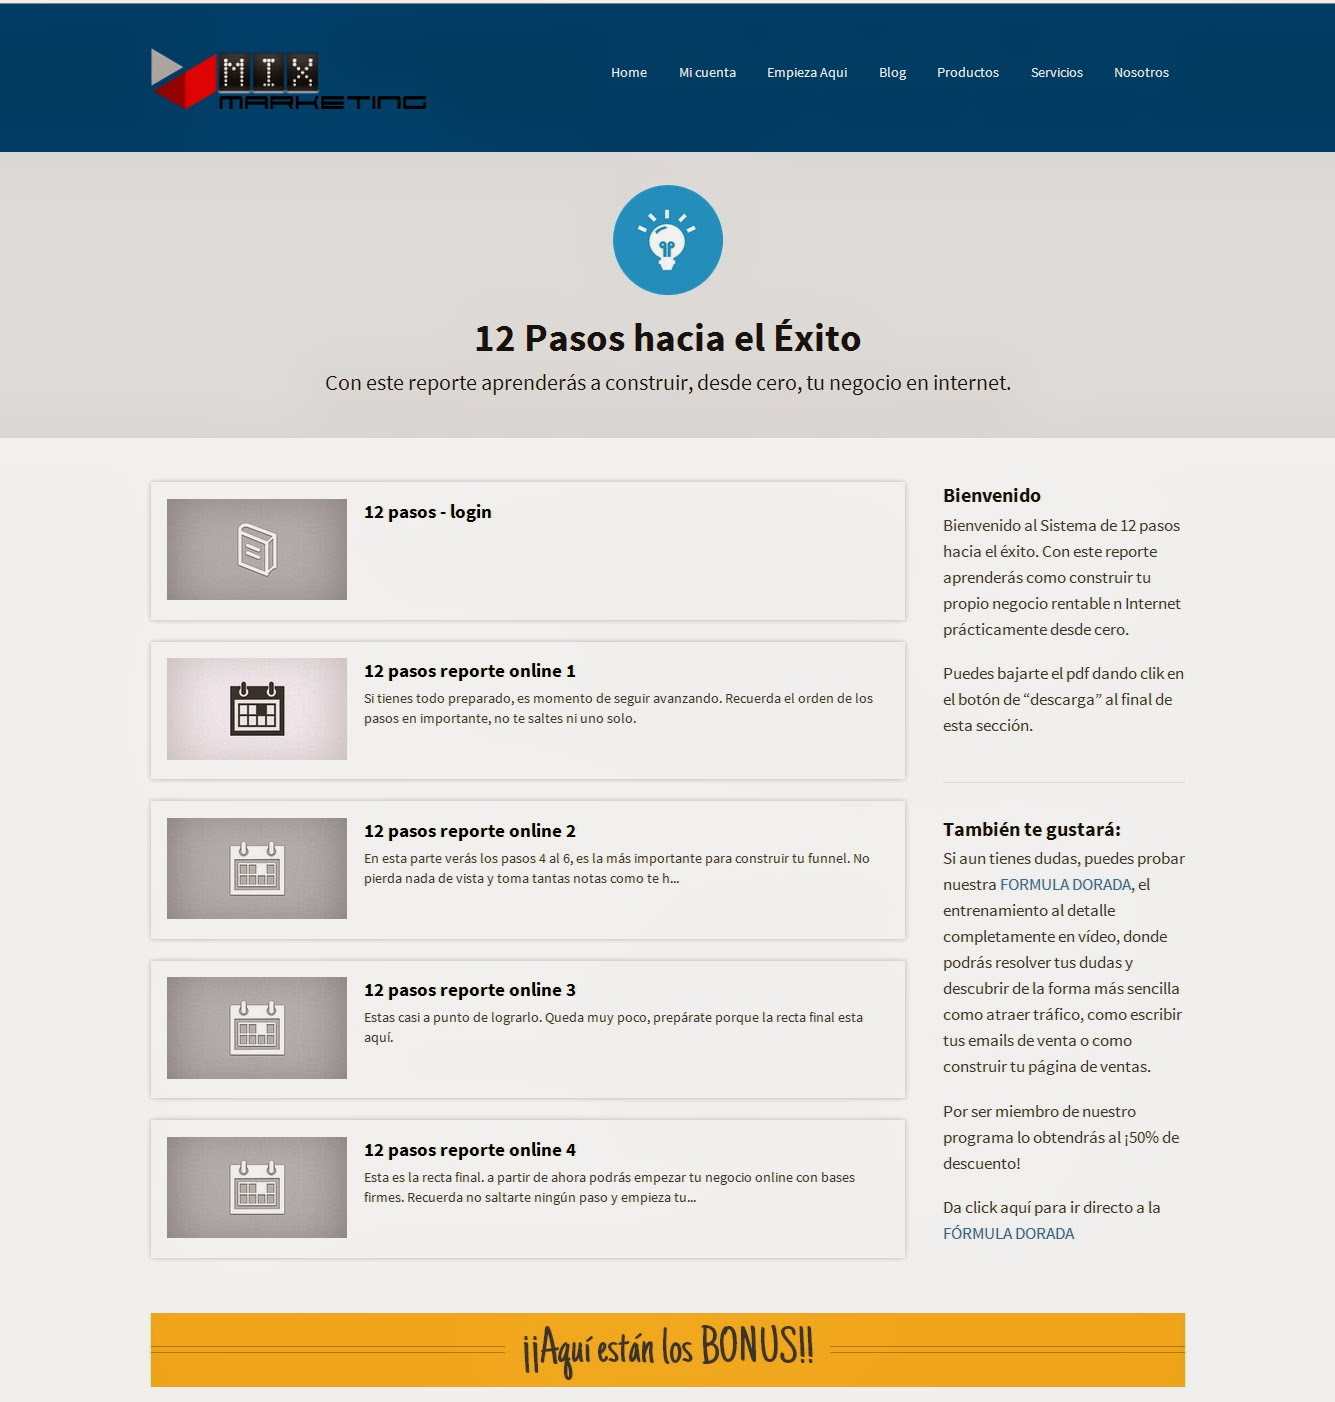 http://miembudodeventas.com/12pasosdescarga